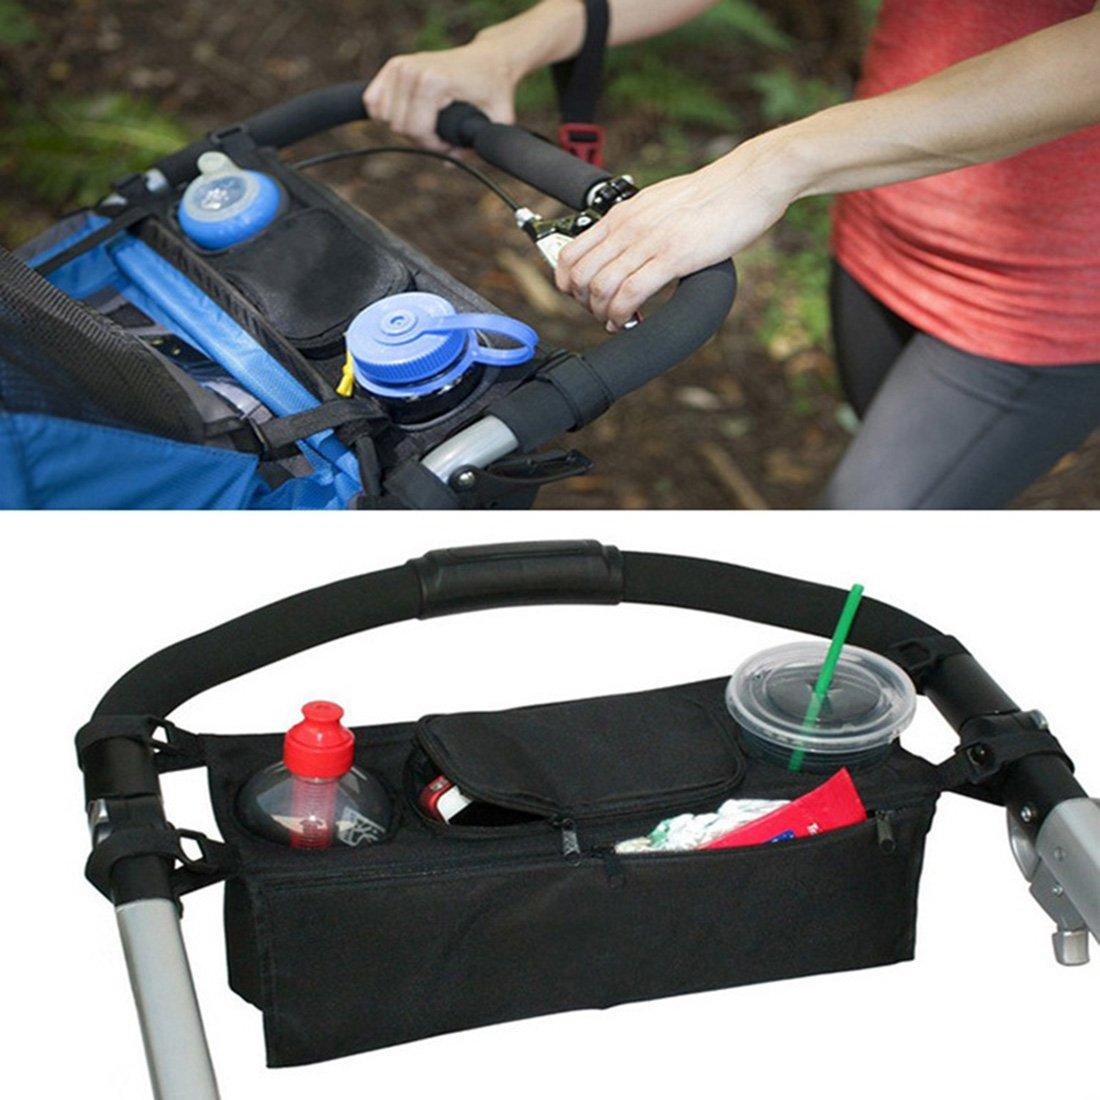 Qianle Baby Stroller Storage Organizer Diper Bag Cup Holder Stroller Accessories